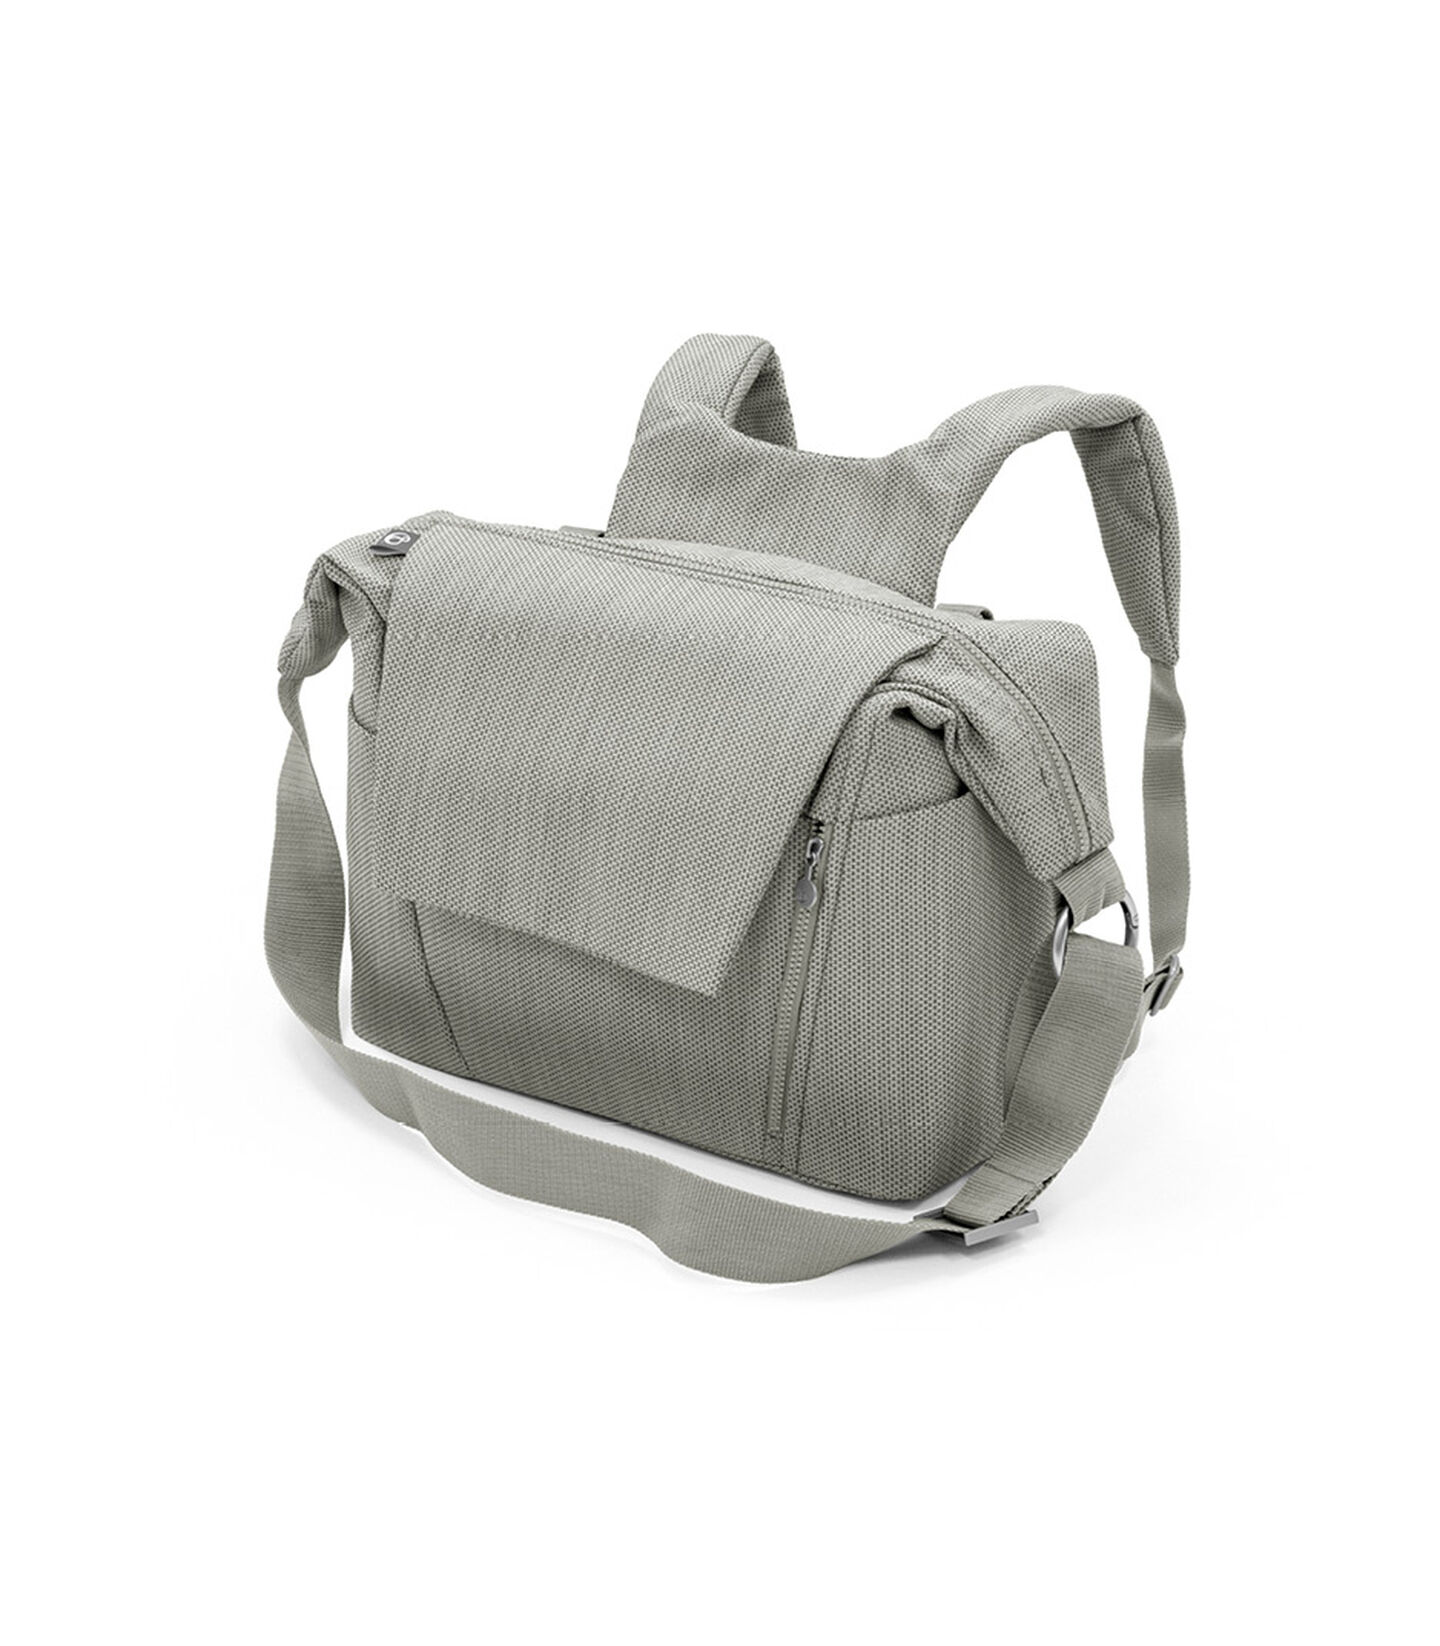 Stokke® Changing bag Brushed Grey, Brushed Grey, mainview view 2